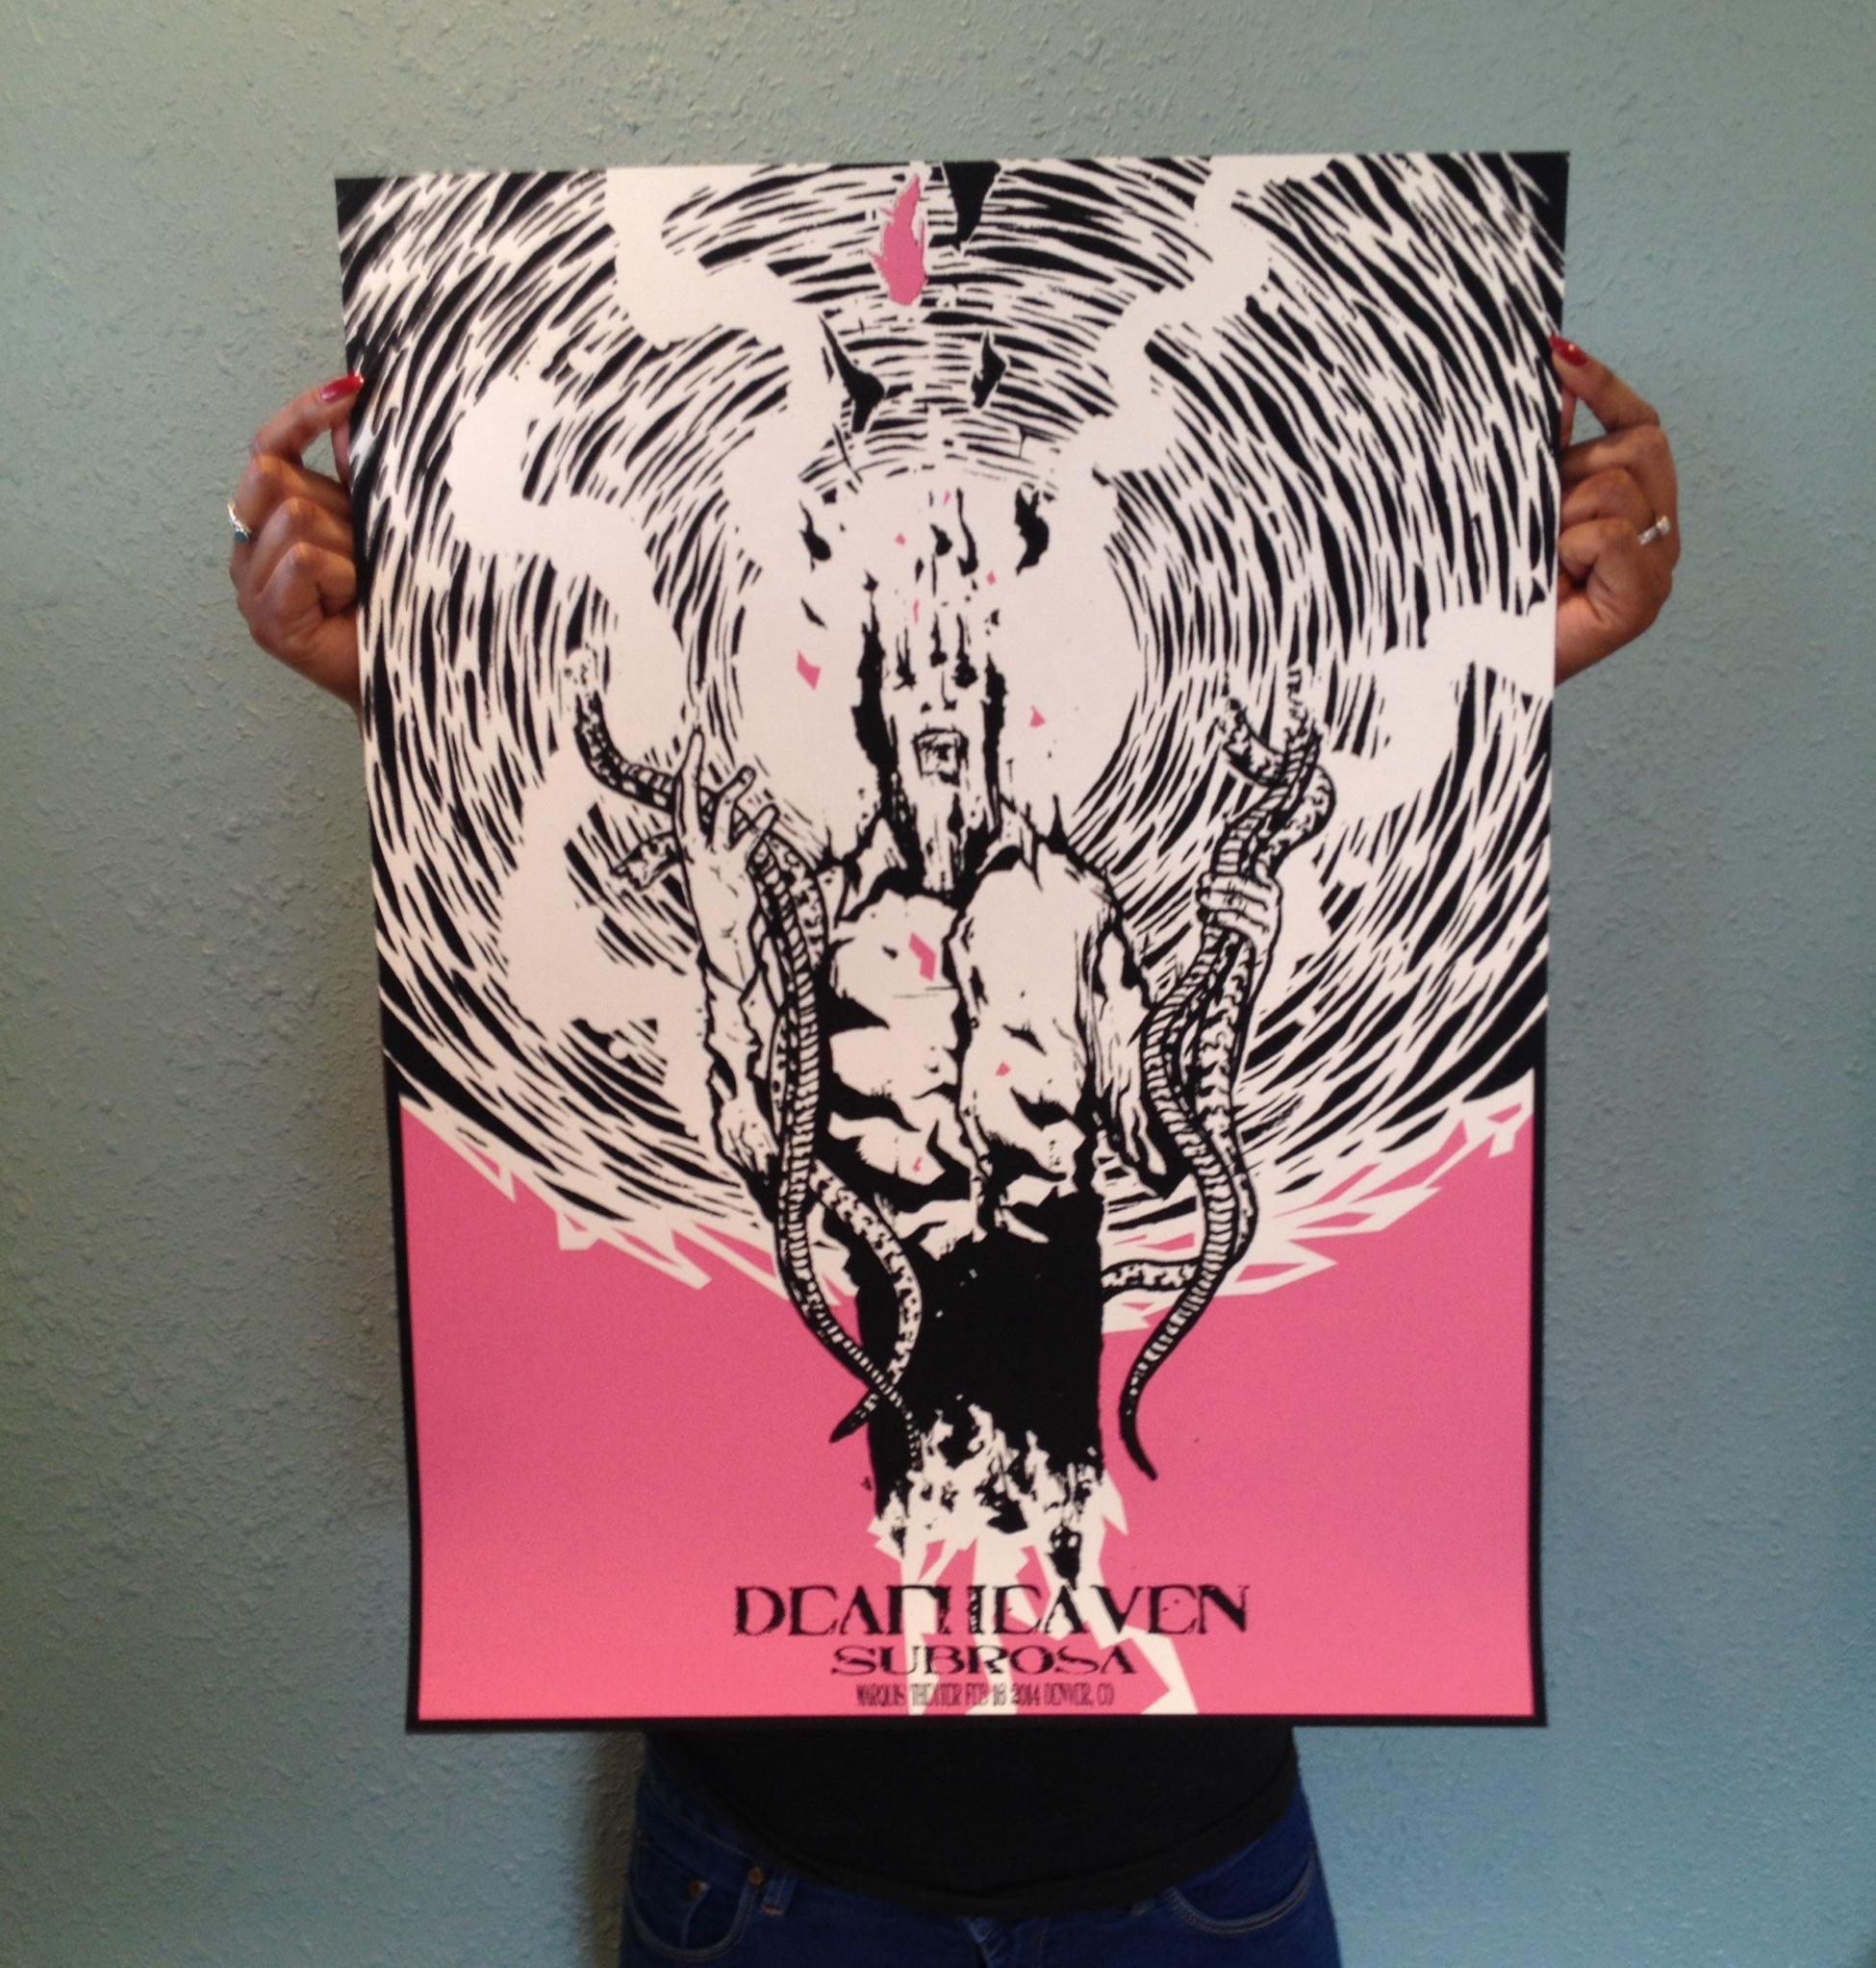 mowry Deafheaven - Denver, CO 2014